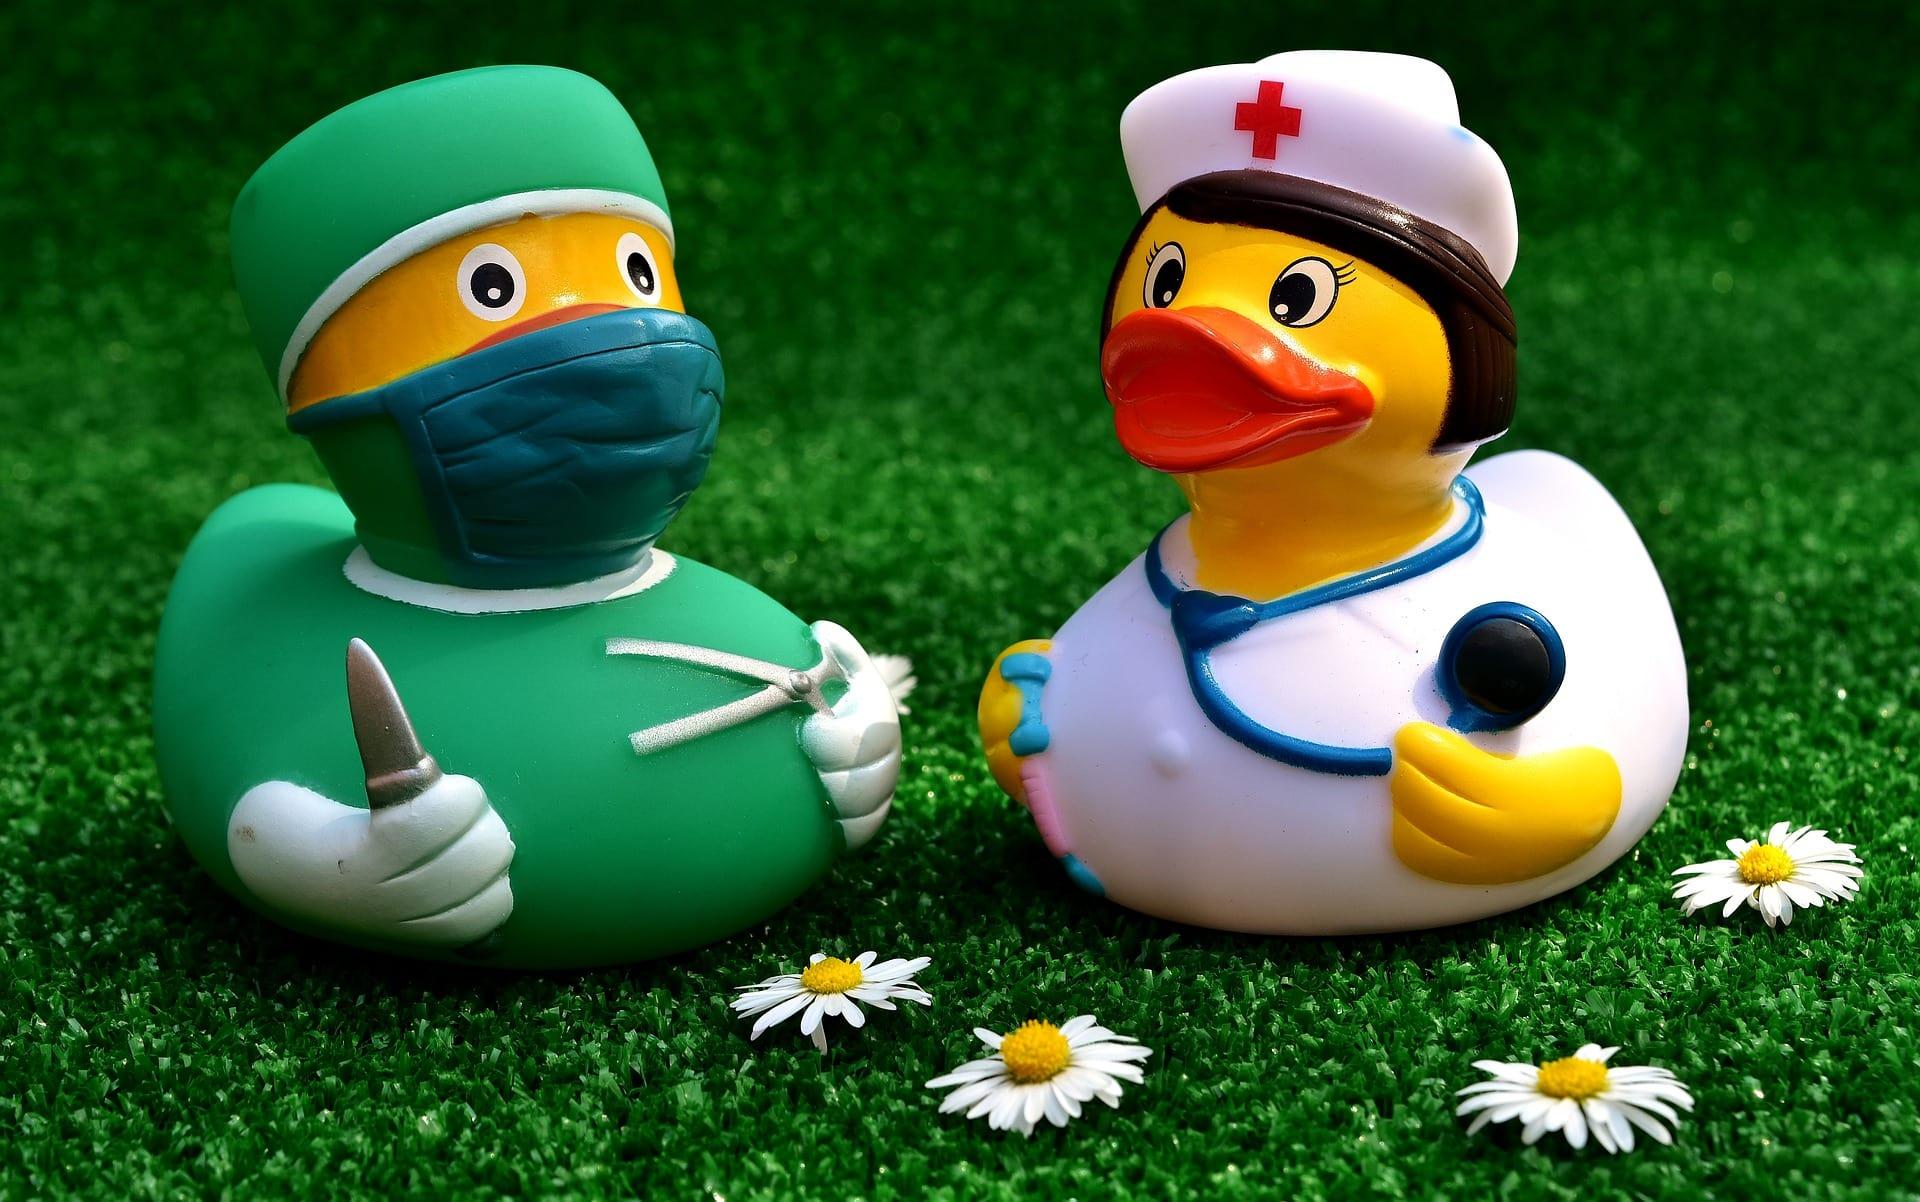 A Guide to Negotiating Your Medical Bills | HealthCare.com